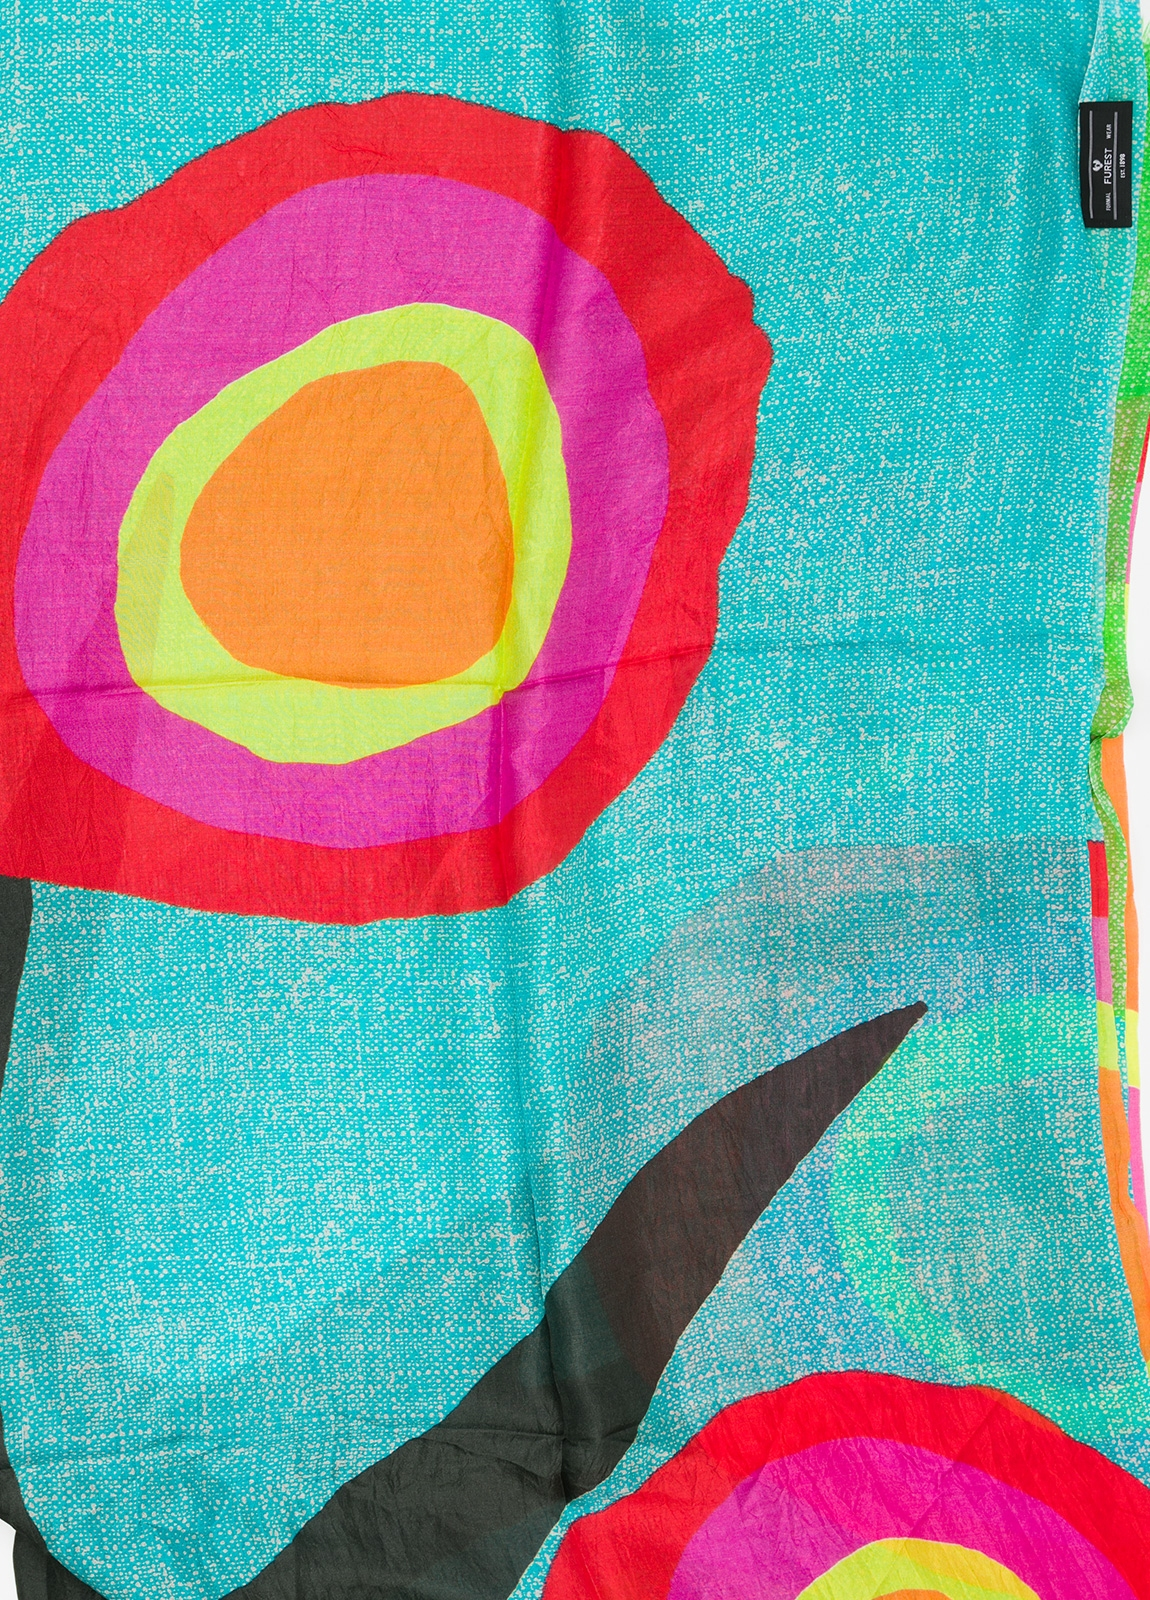 Foulard estampado étnico color turquesa, 100 x 200 cm. 100% Seda. - Ítem1